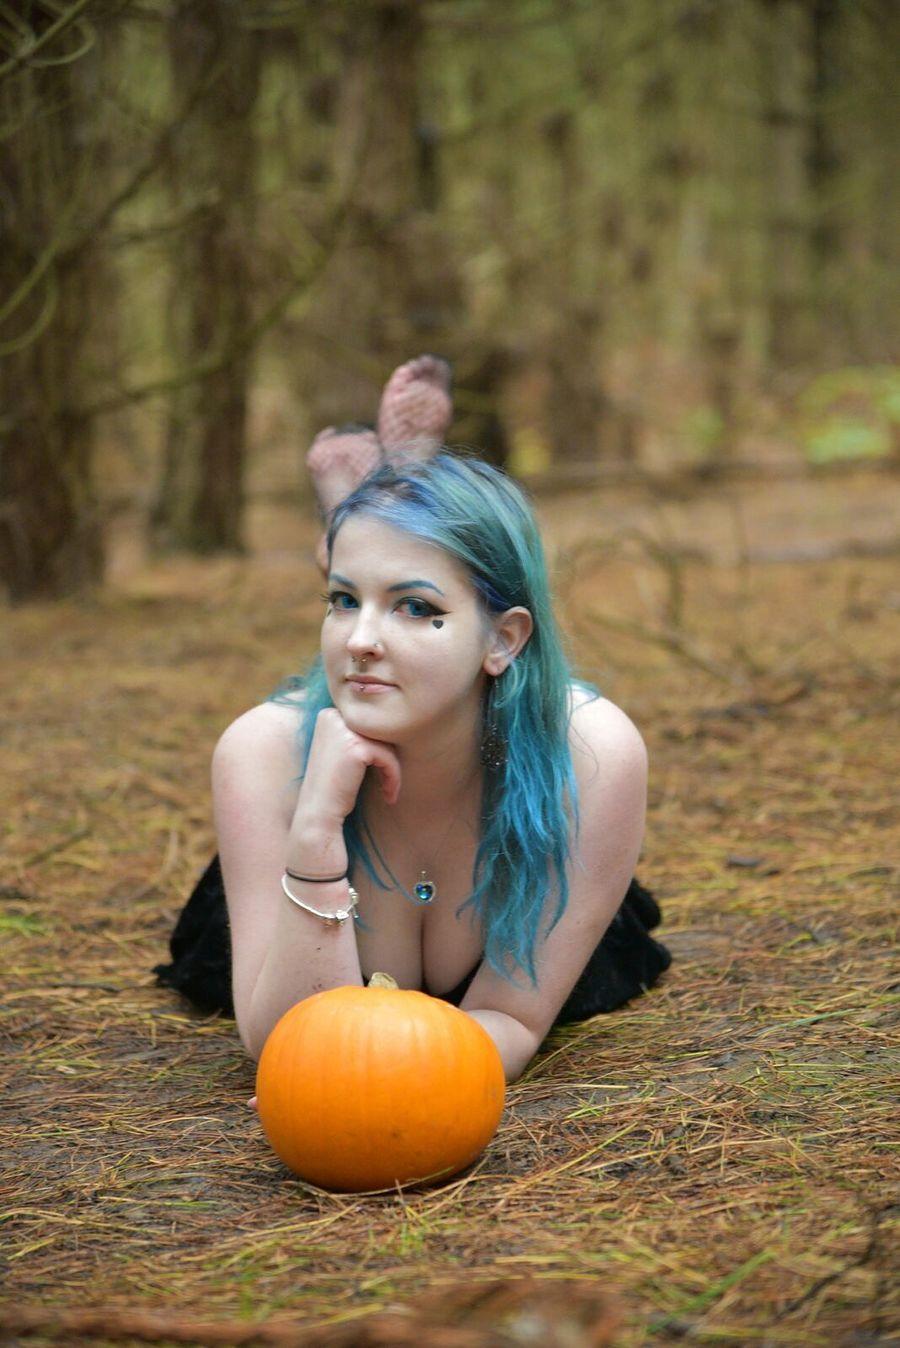 Photography by Jono Purday, Model Beckybb / Uploaded 13th November 2019 @ 11:30 PM